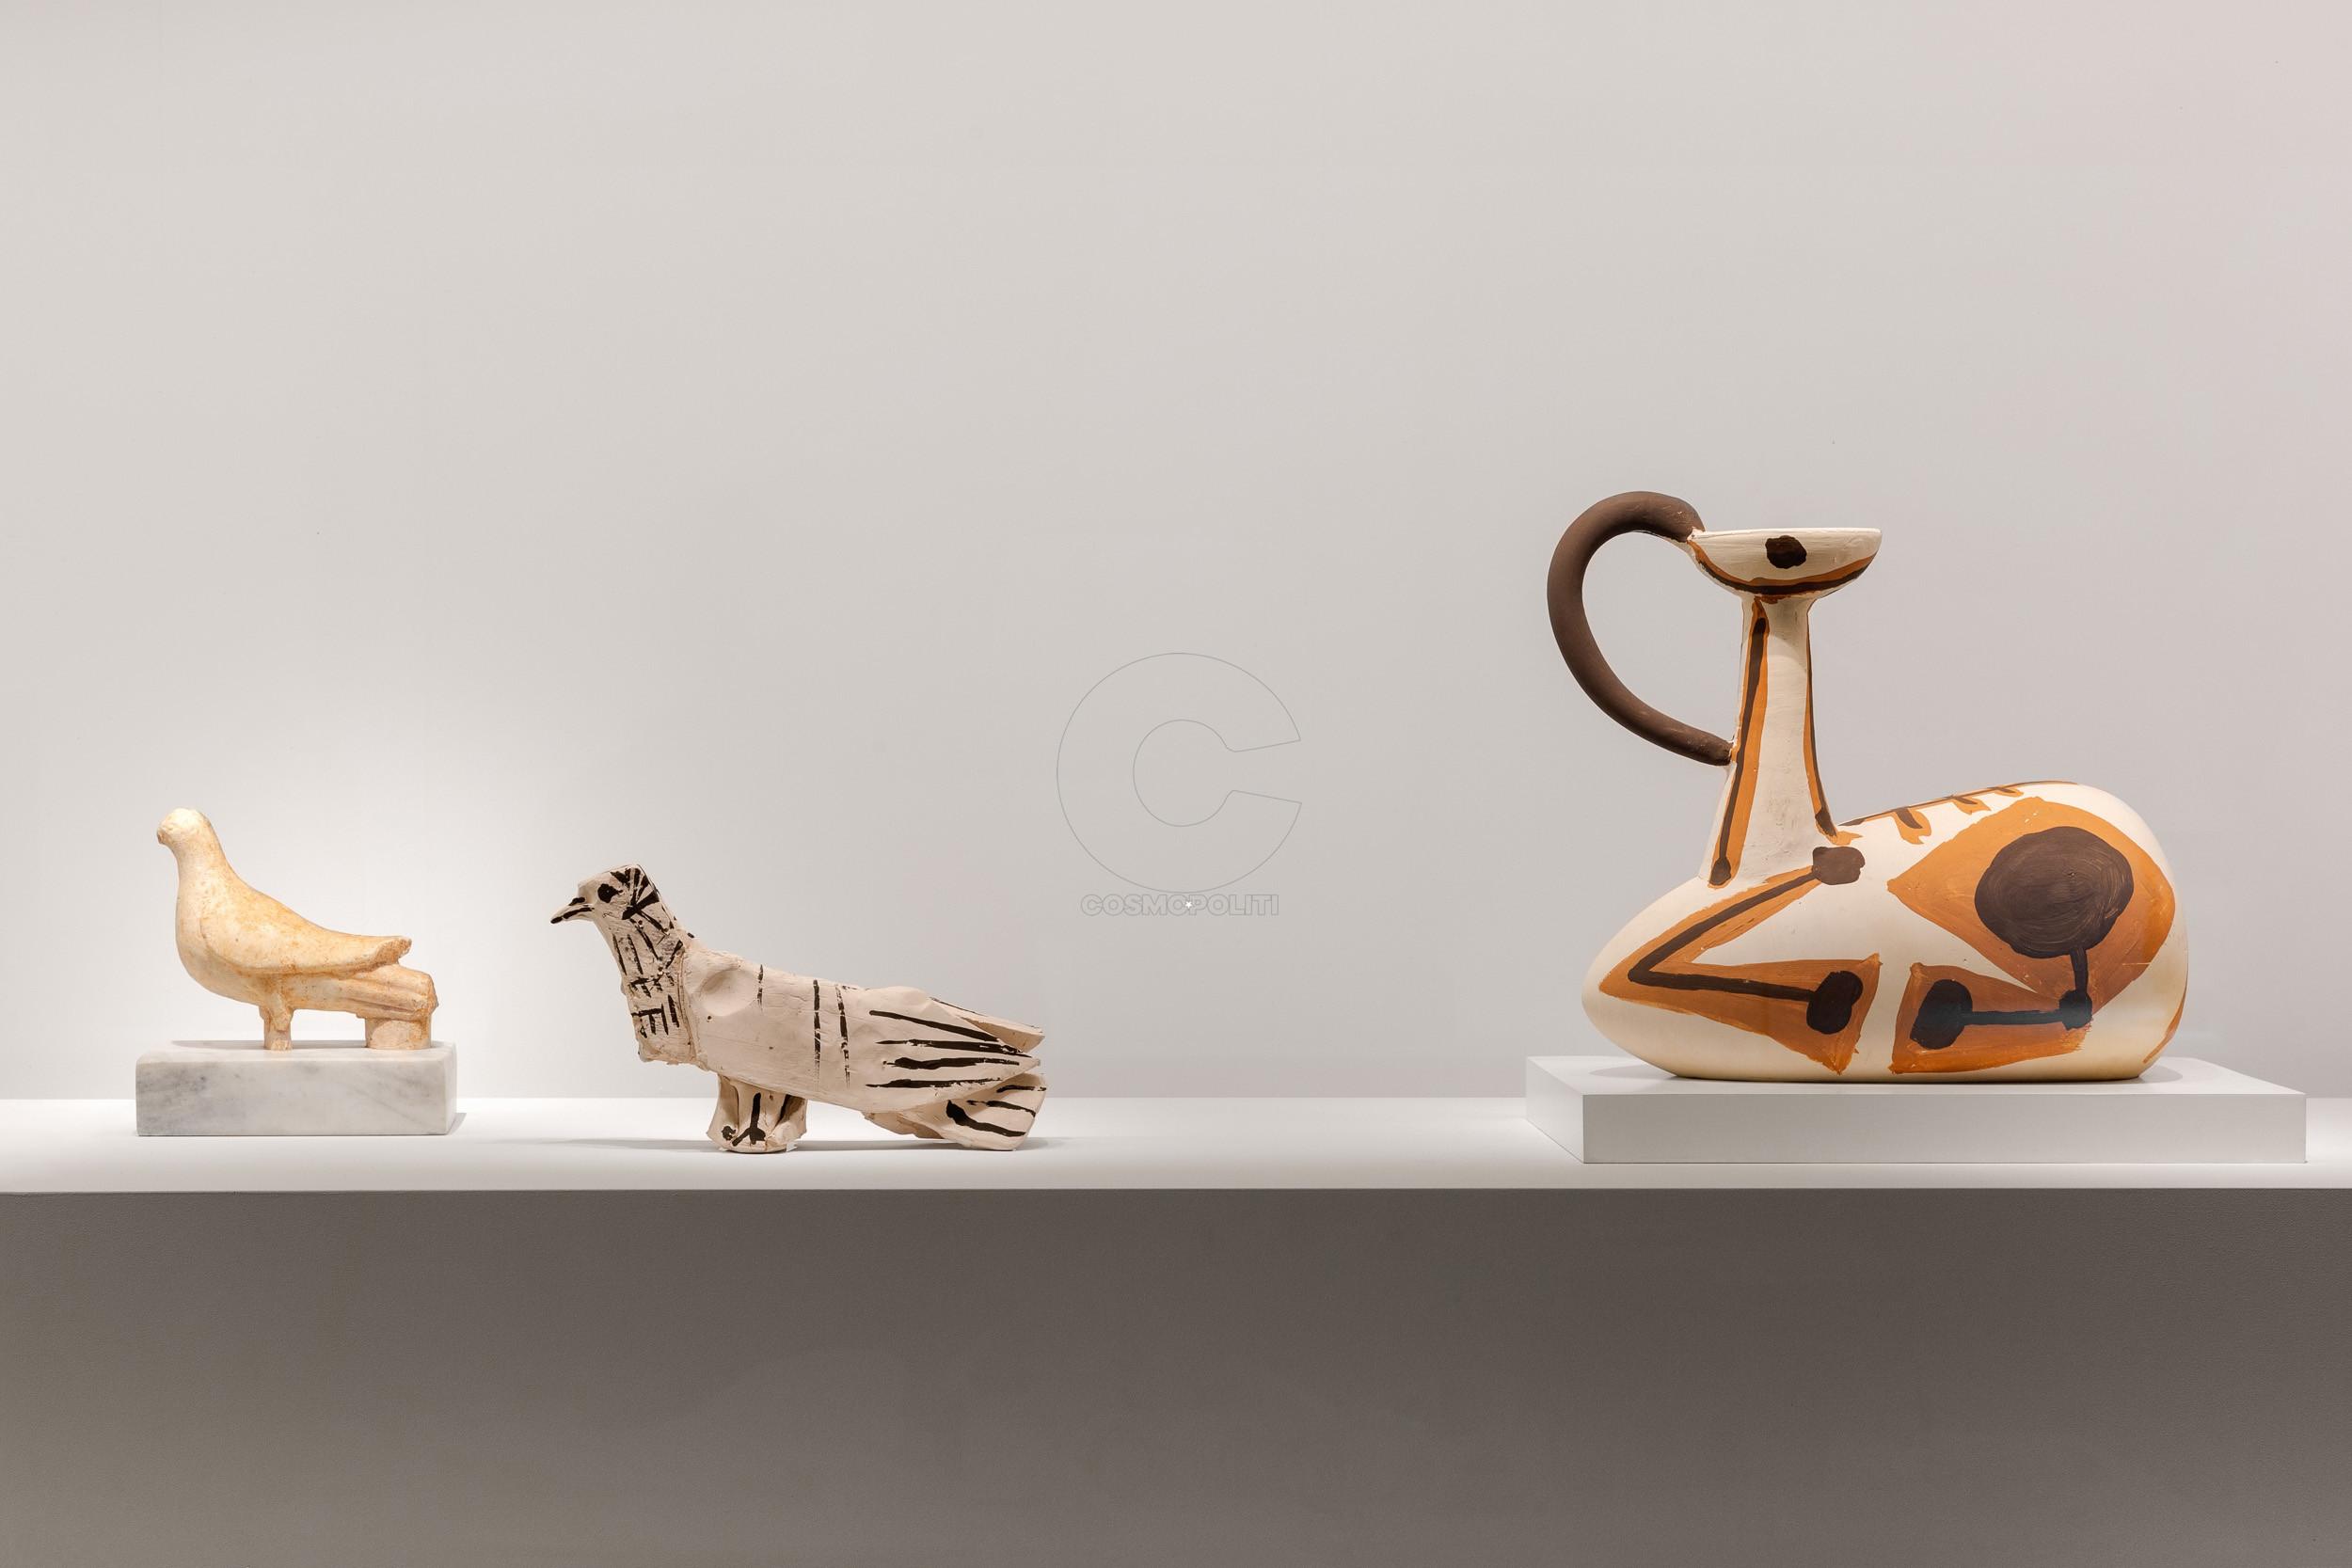 13_MUSEUM OF CYCLADIC ART© PHOTO PARIS TAVITIAN